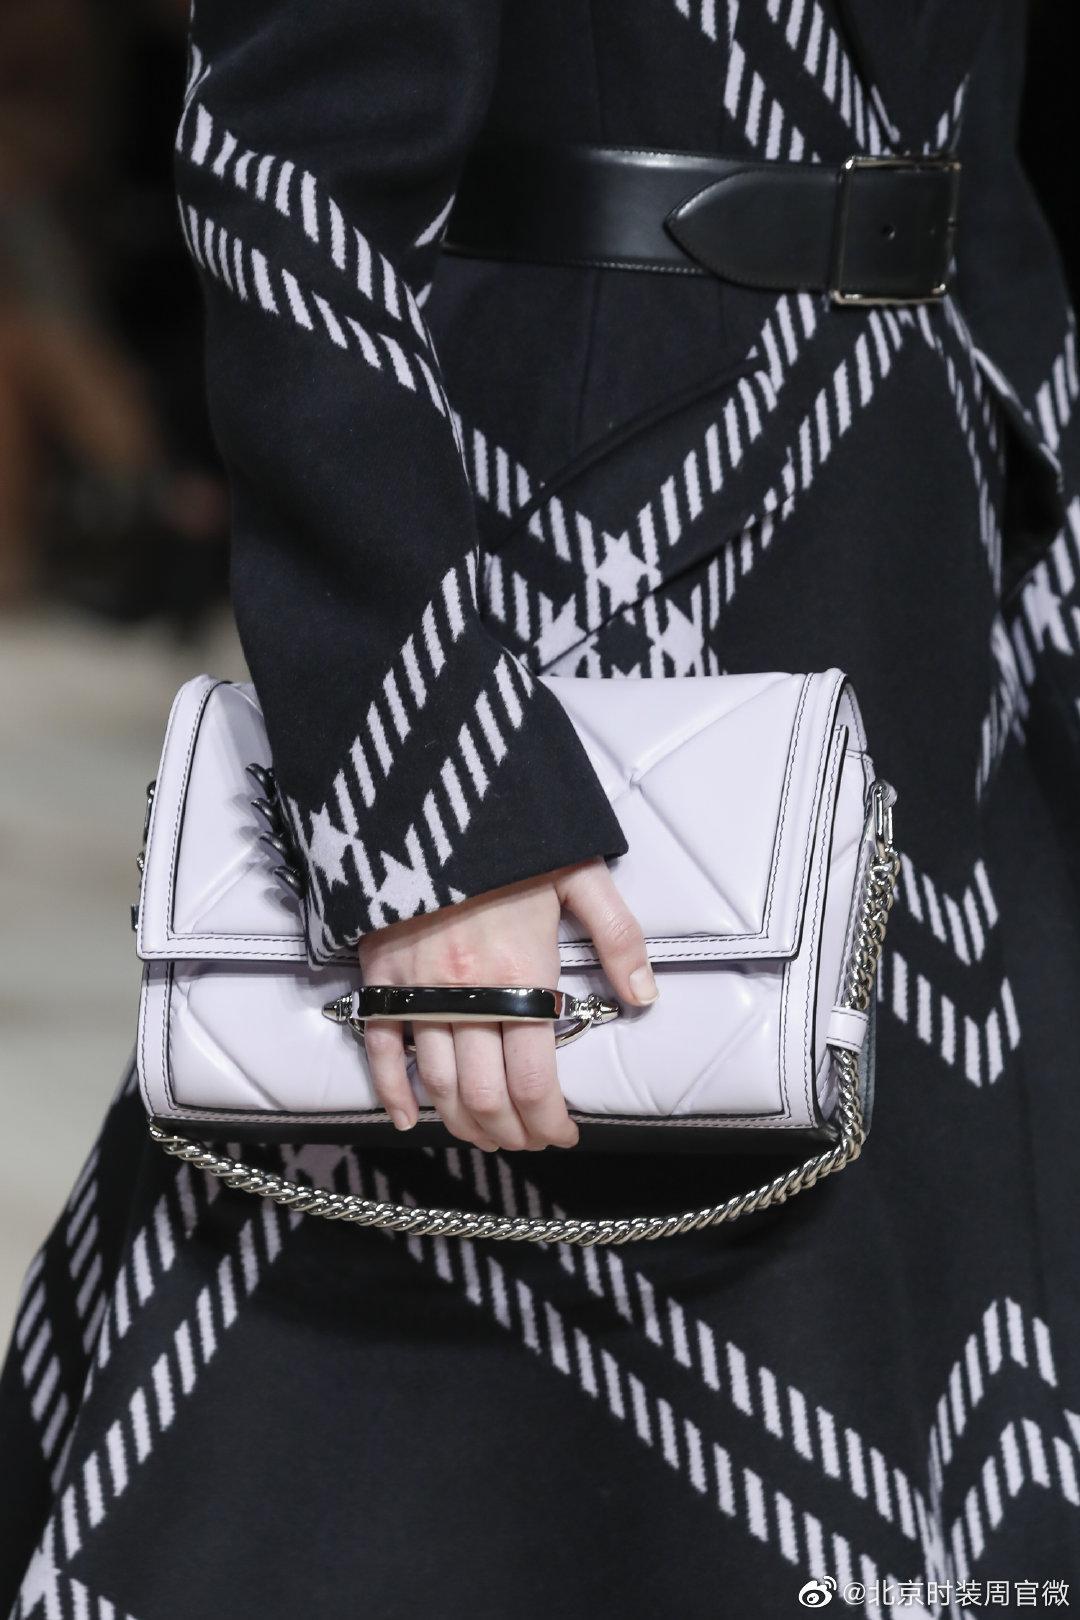 Alexander McQueen 2020秋冬系列推出 The Story手袋和The Story